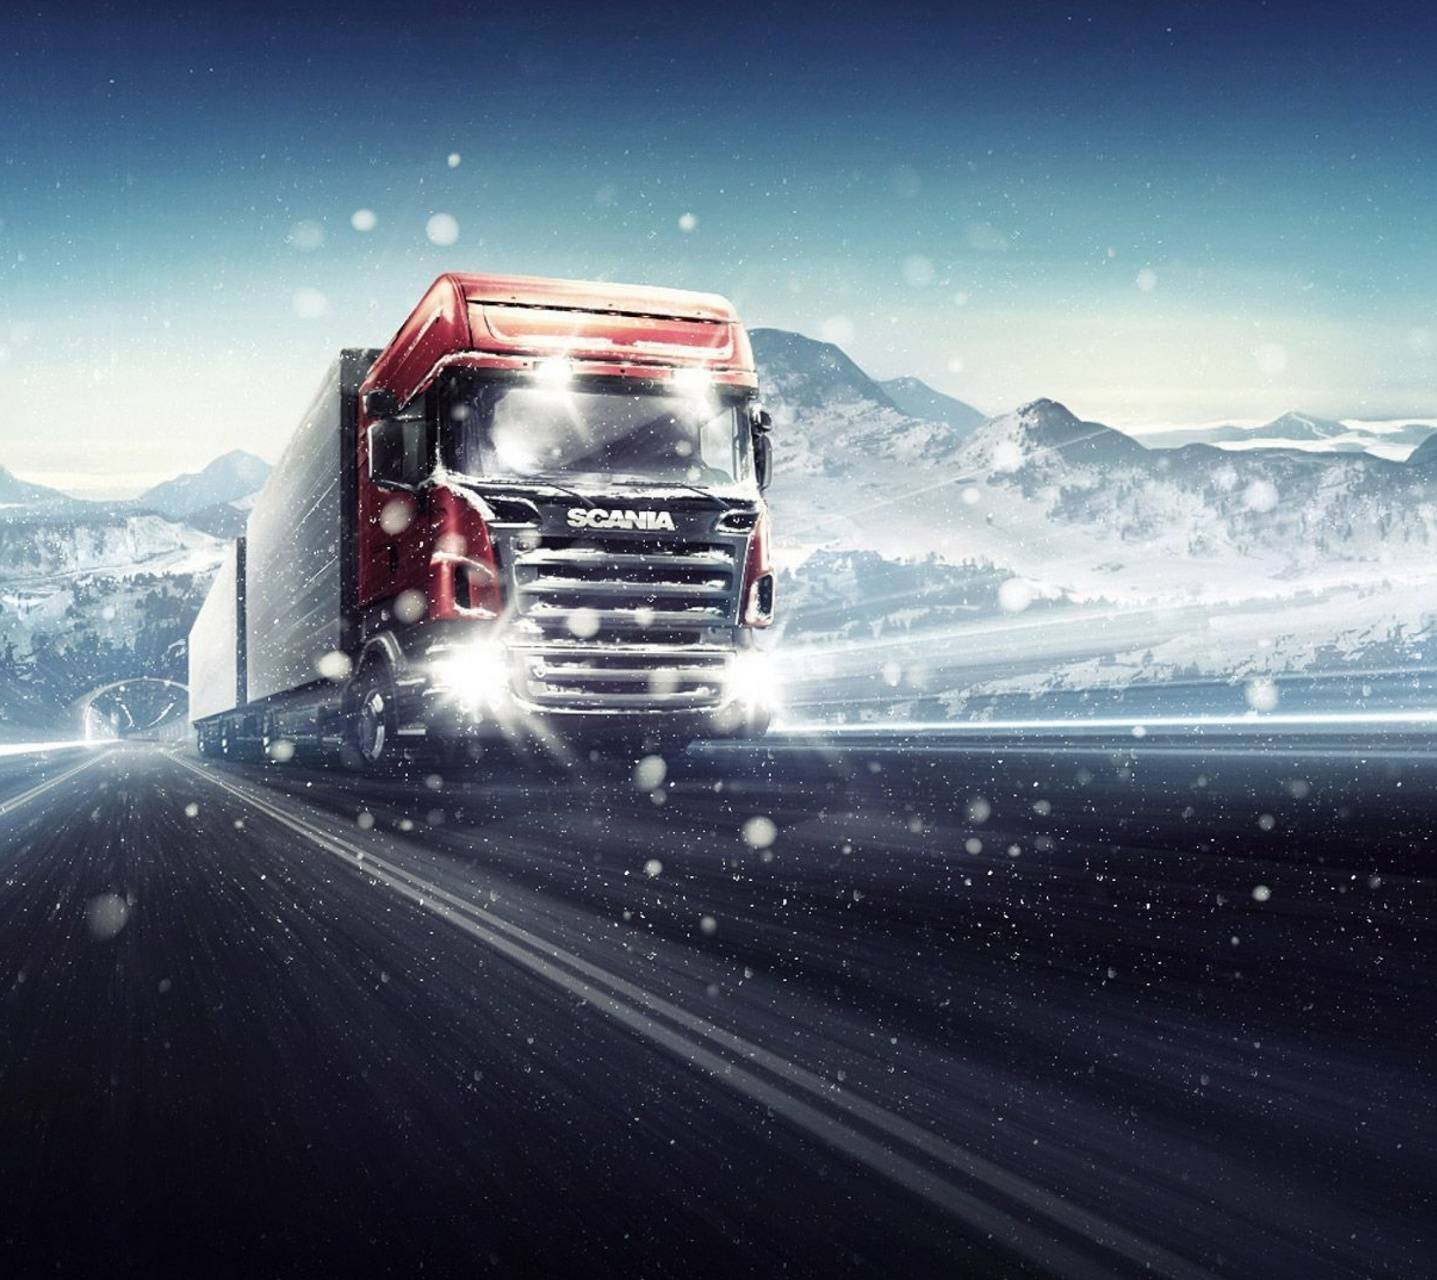 Scania Winter Truck